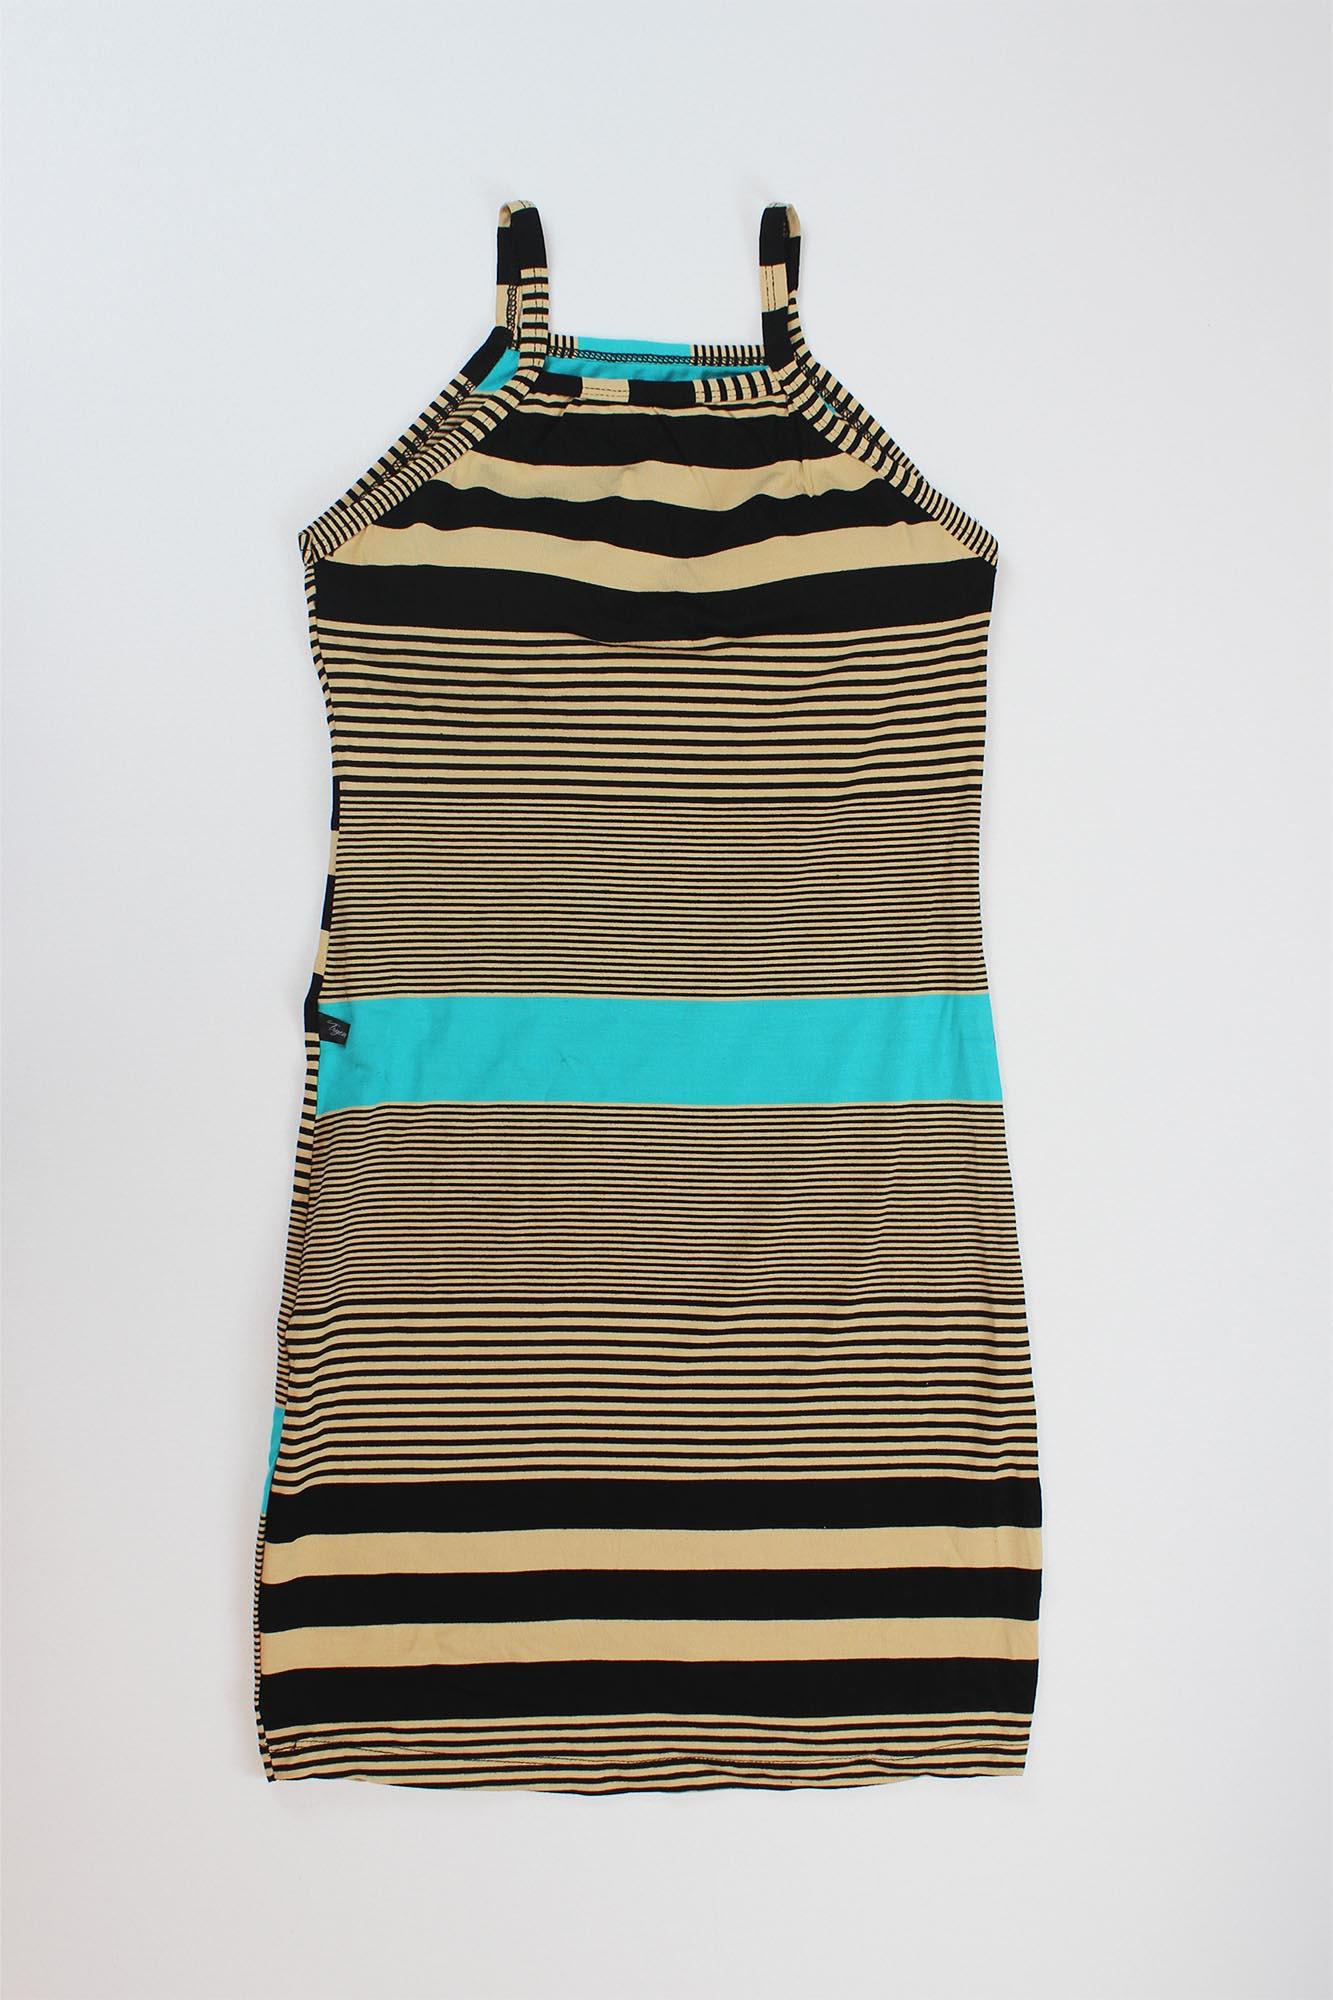 Vestido Curto Listrado com Bojo Feminino - Preto, Bege e Azul Turquesa